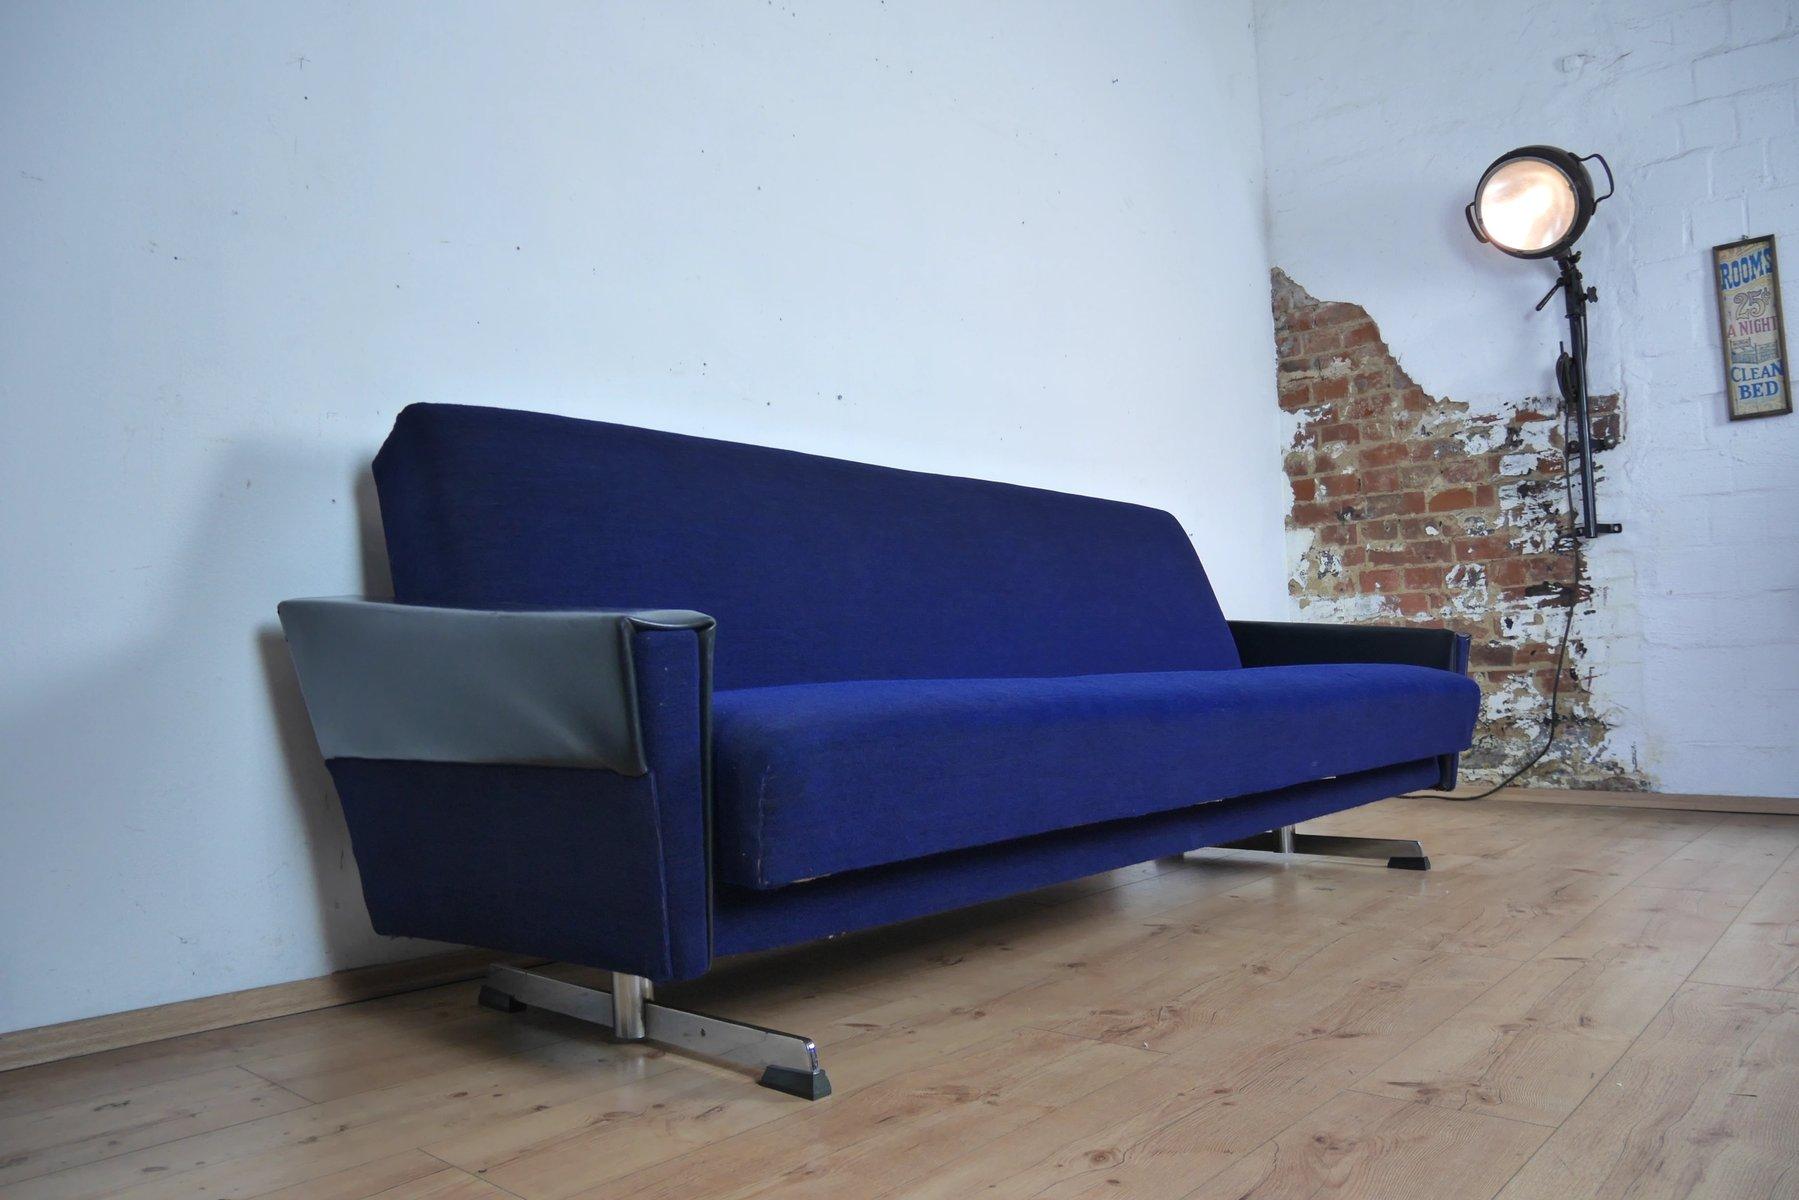 Blaues Vintage Sofa oder Tagesbett